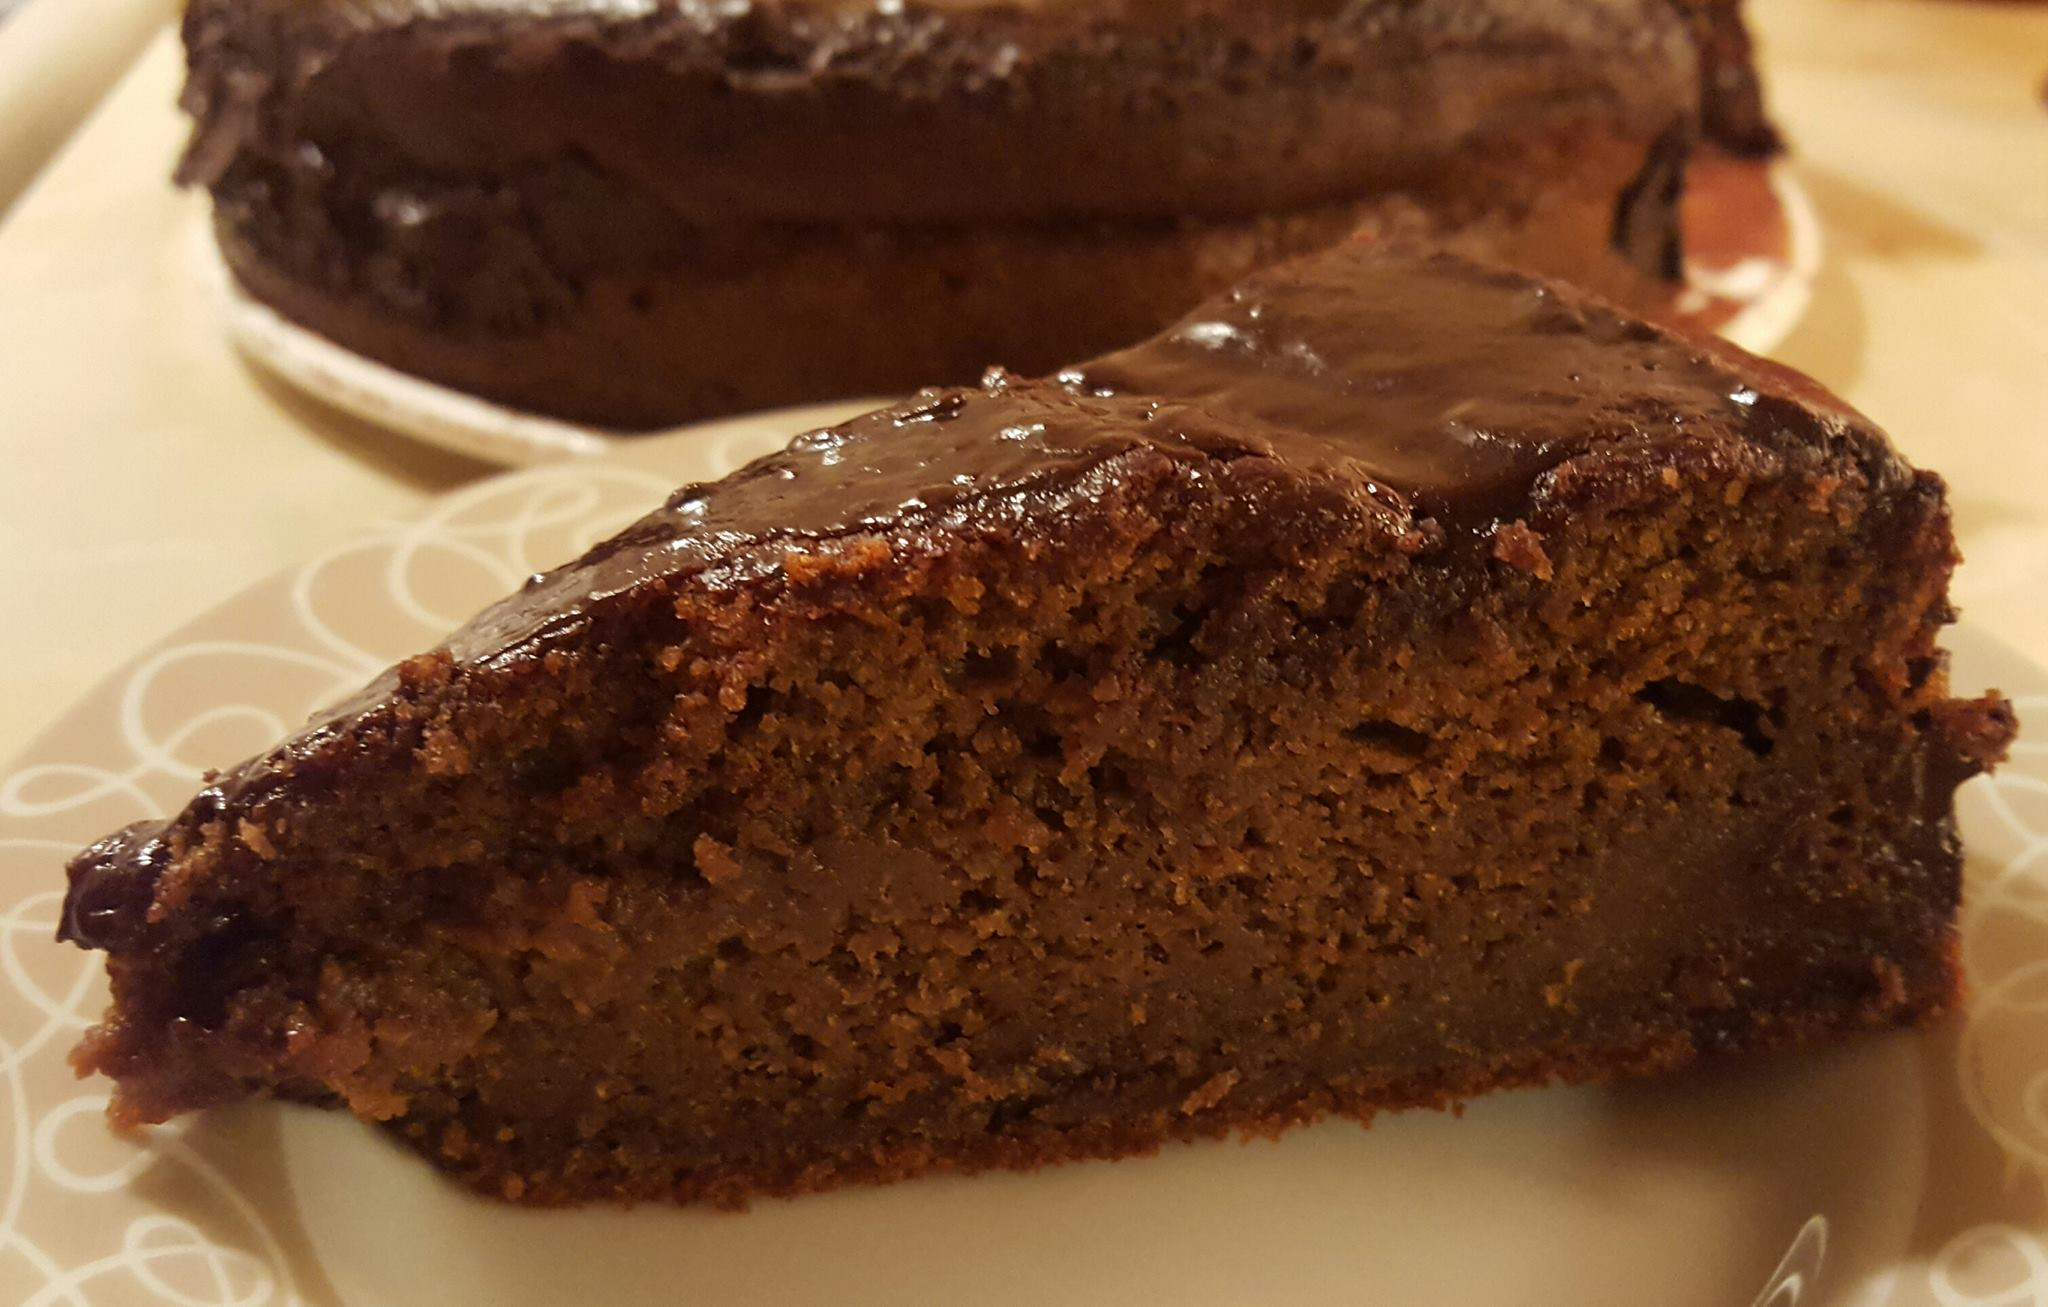 12922341 1009164862497465 709127770 o - Шоколадный торт 2